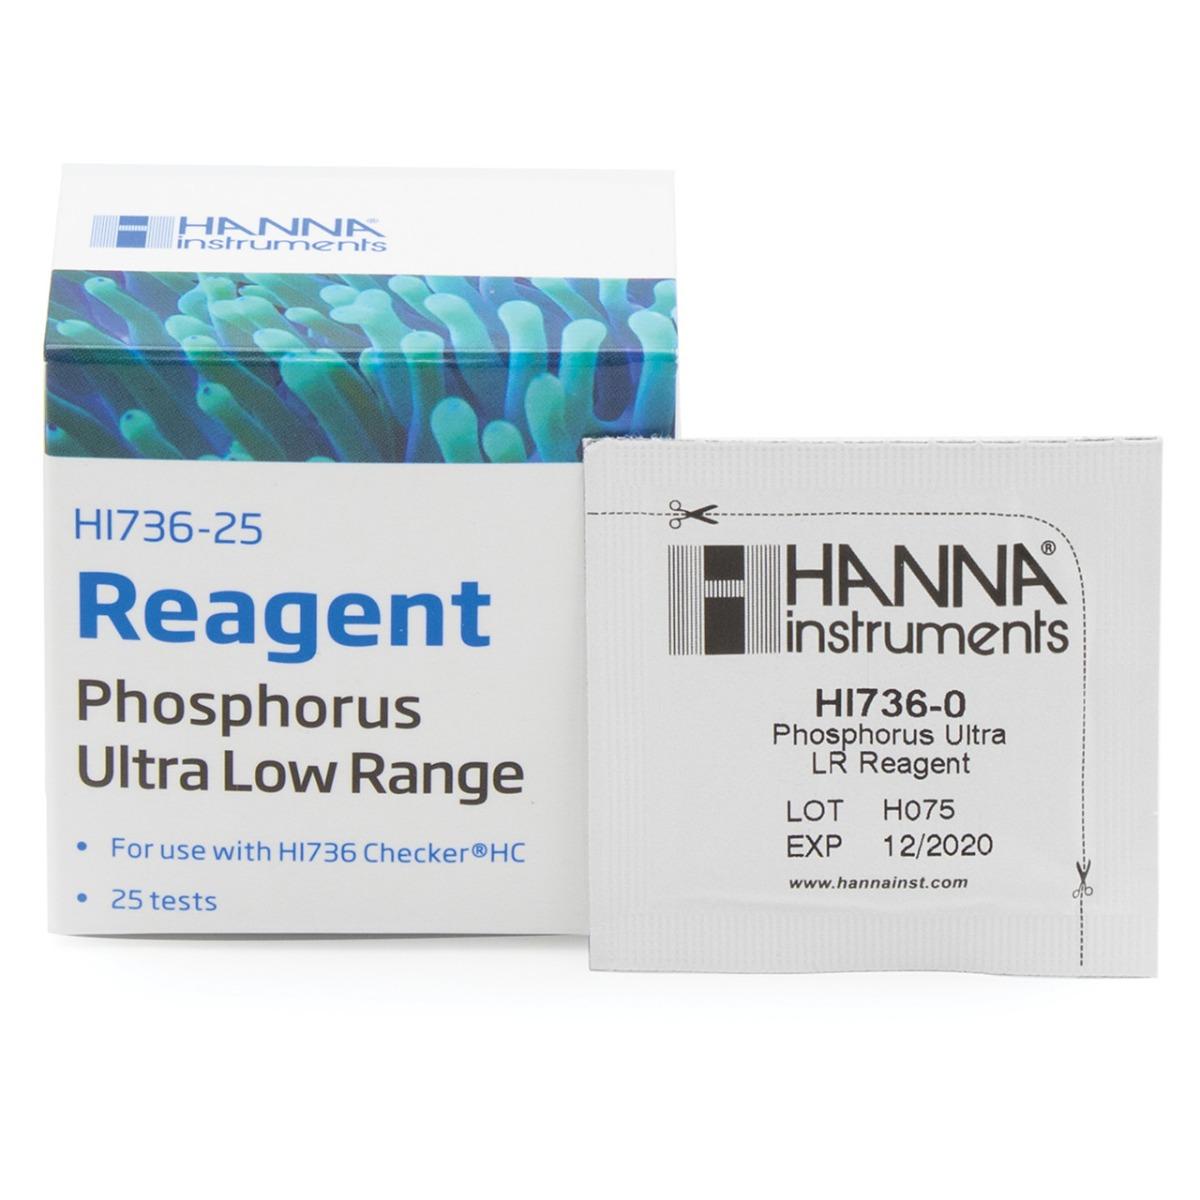 HI736-25 Phosphorus Ultra Low Range Checker® HC Reagents (25 tests)